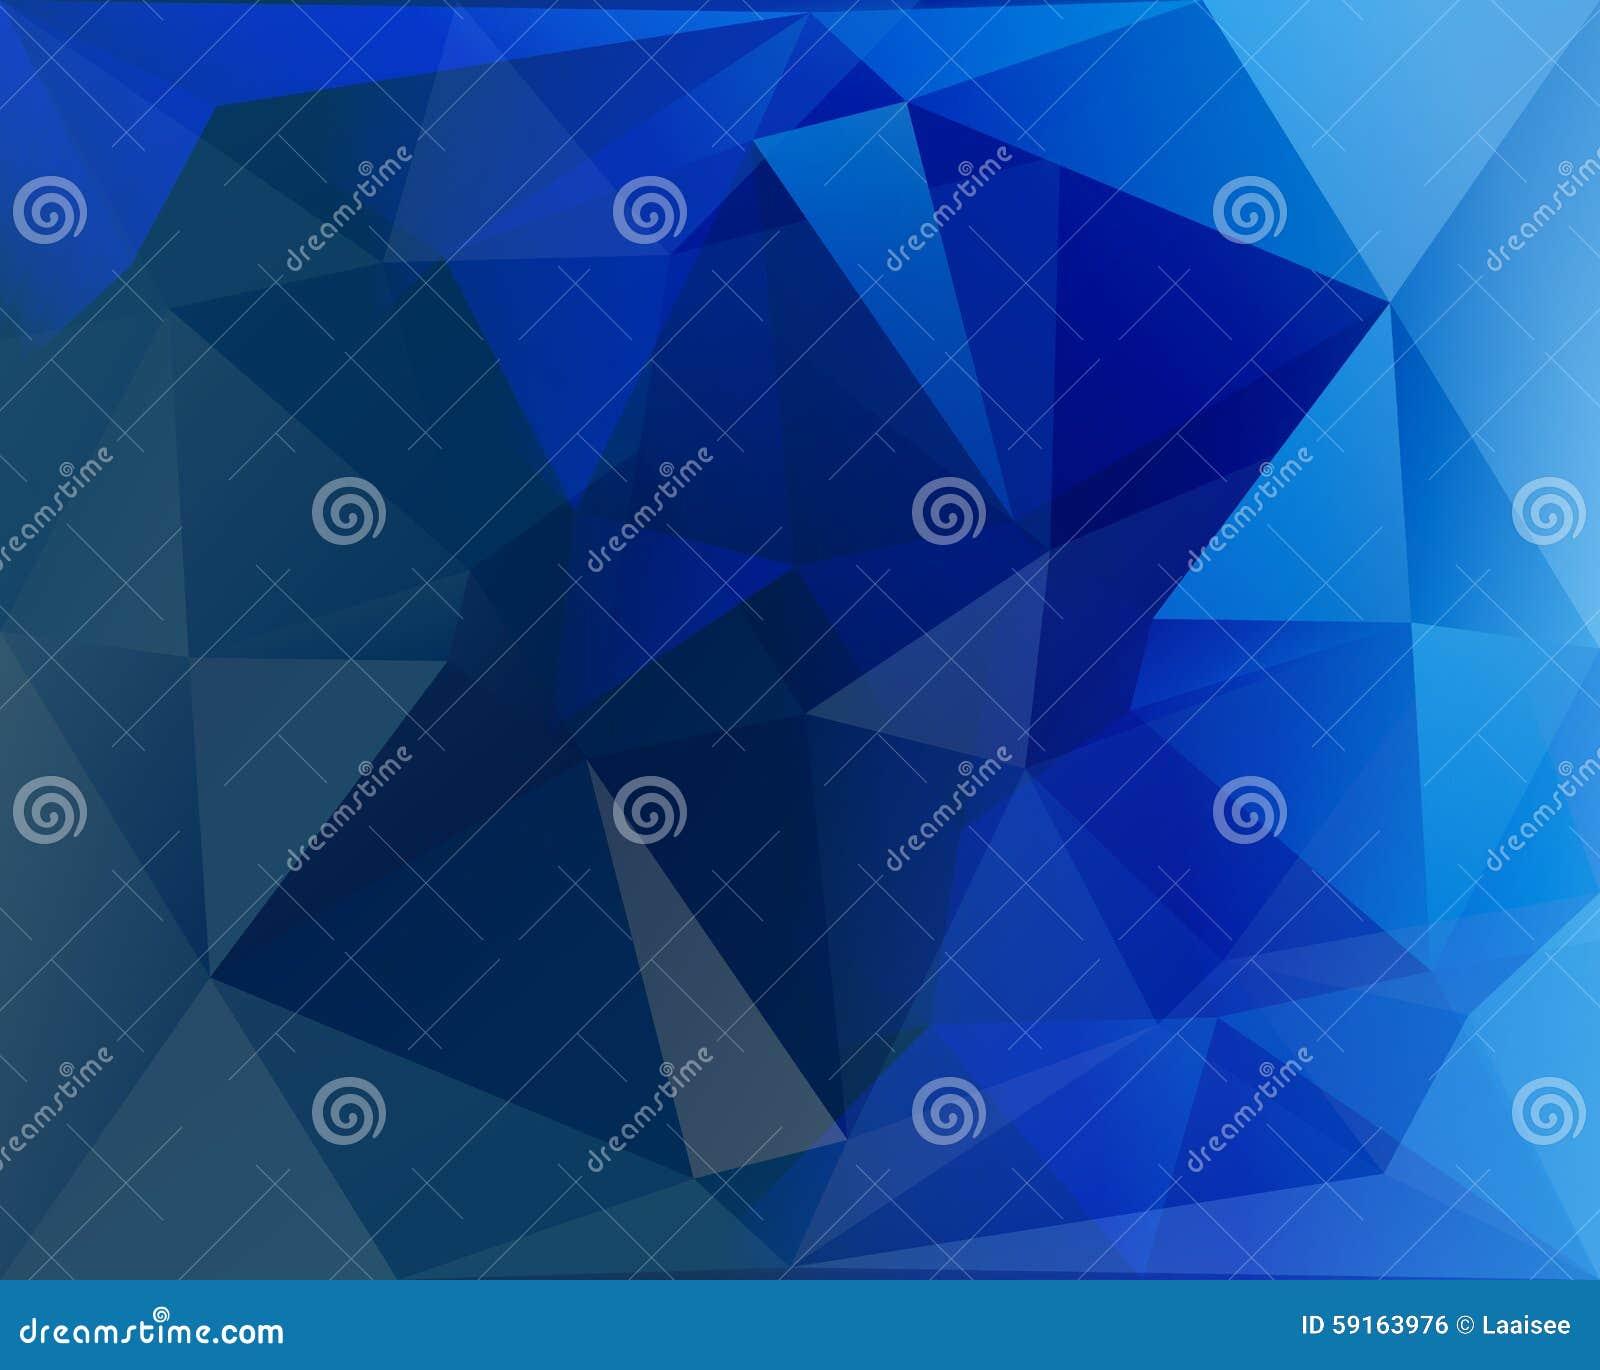 Fundo poligonal, azul, branco e turquesa do vetor do triângulo